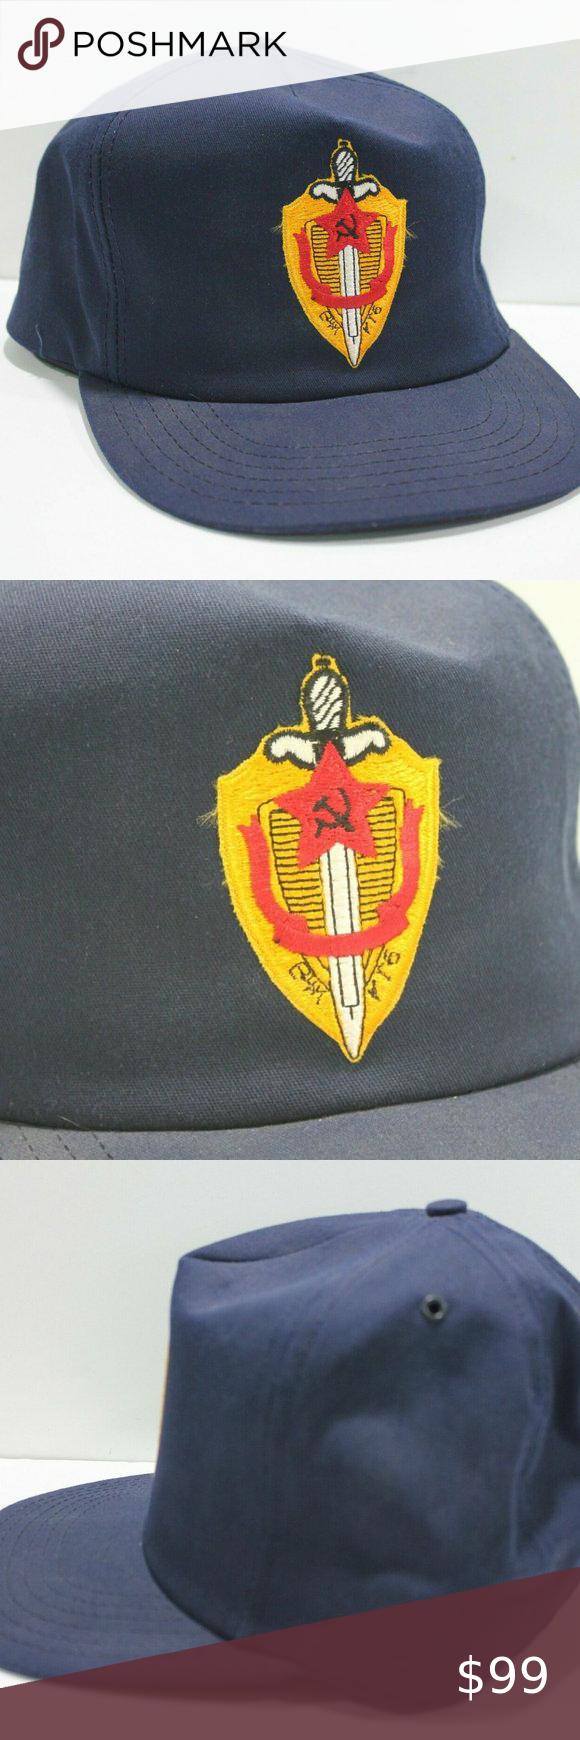 Hat Cap Trucker Snapback Soviet Union Kgb Usa Made Soviet Union Kgb Trucker Hat Snapback Made In The Usa Collectors Stash Soviet Union How To Wear Snapback